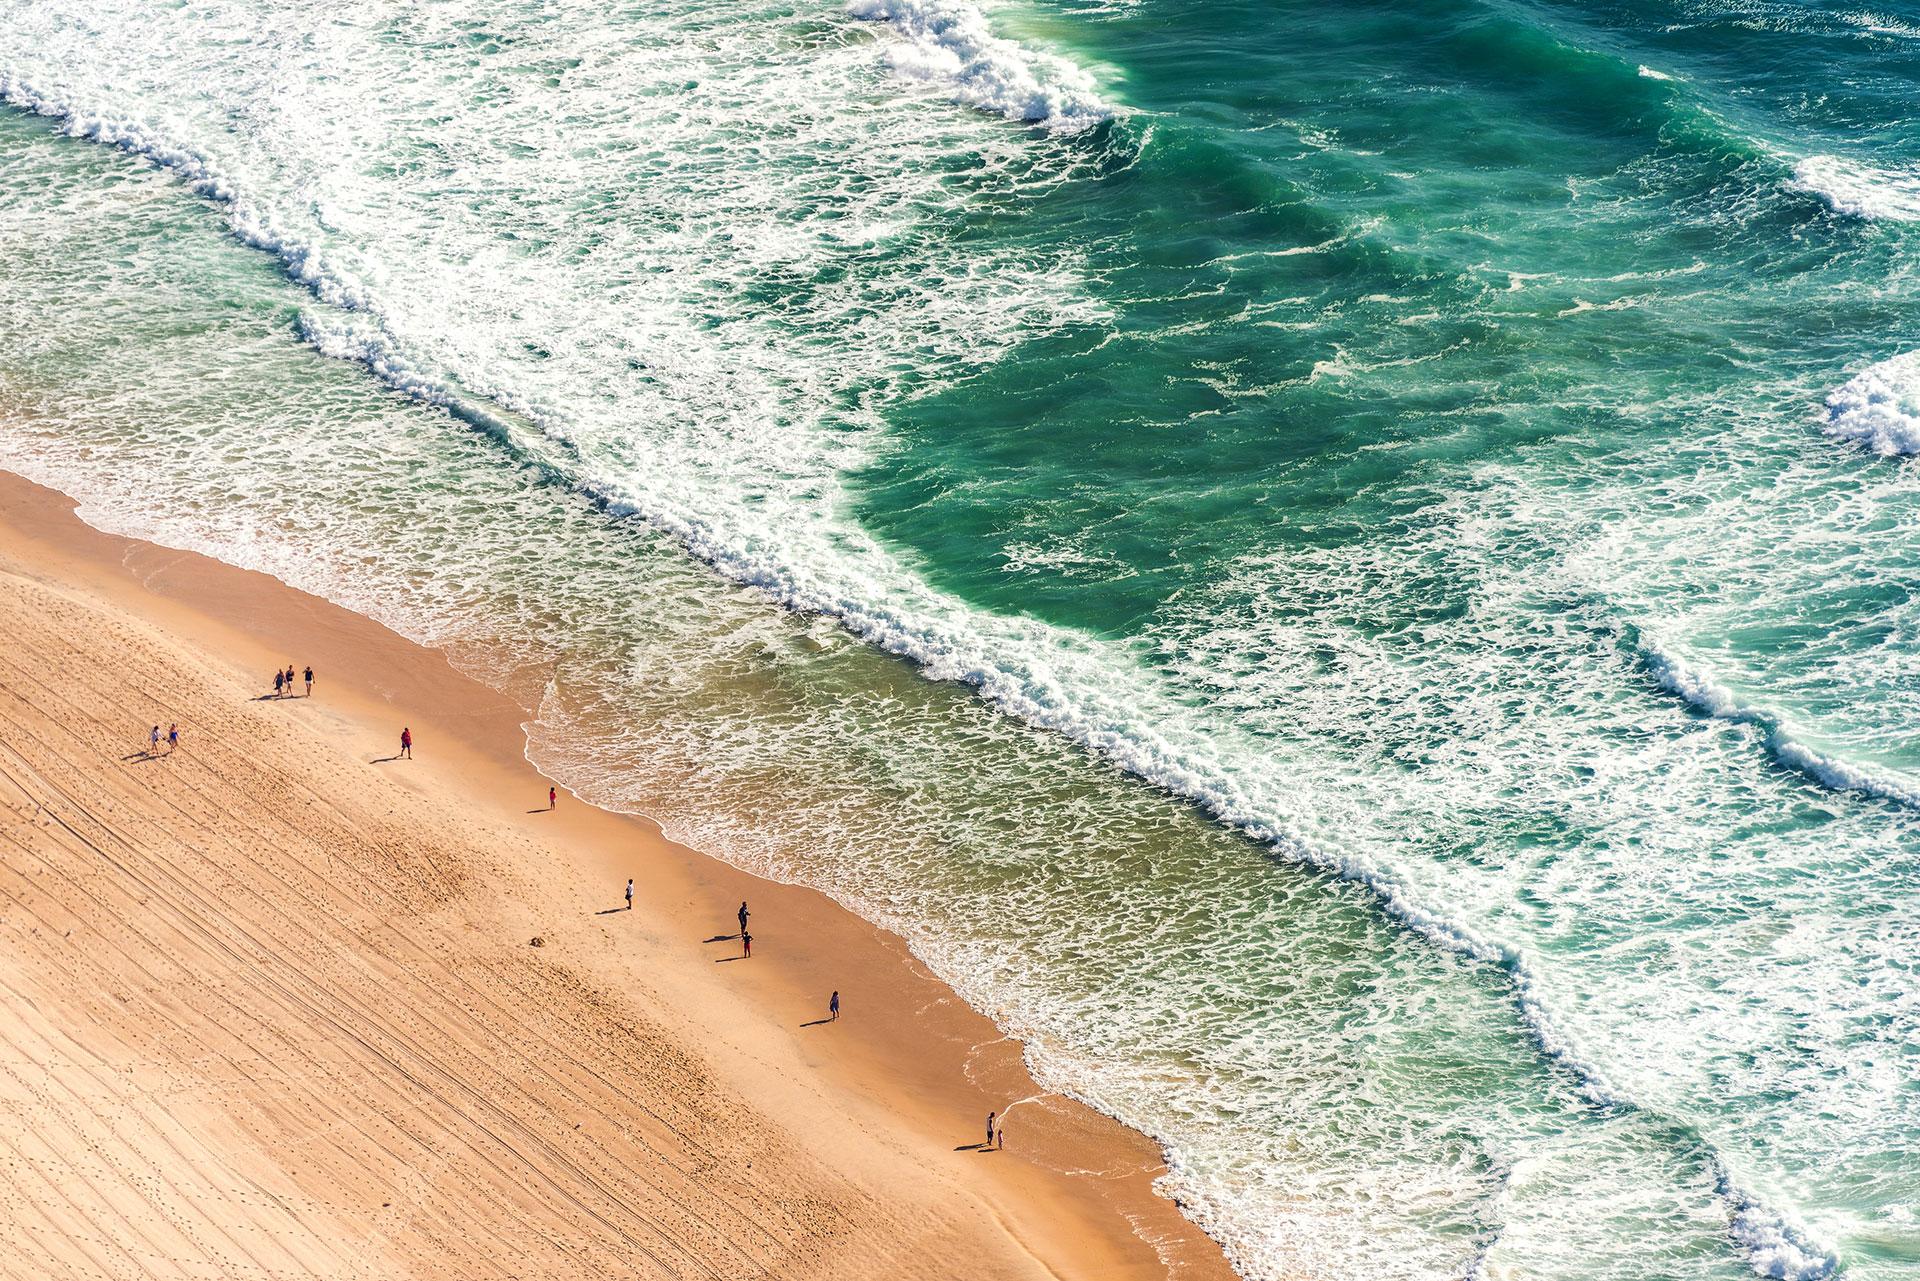 ocean beach personals Treasure coast vacation rentals - craigslist cl  (3150 ocean drive, vero beach)  (treasure island).